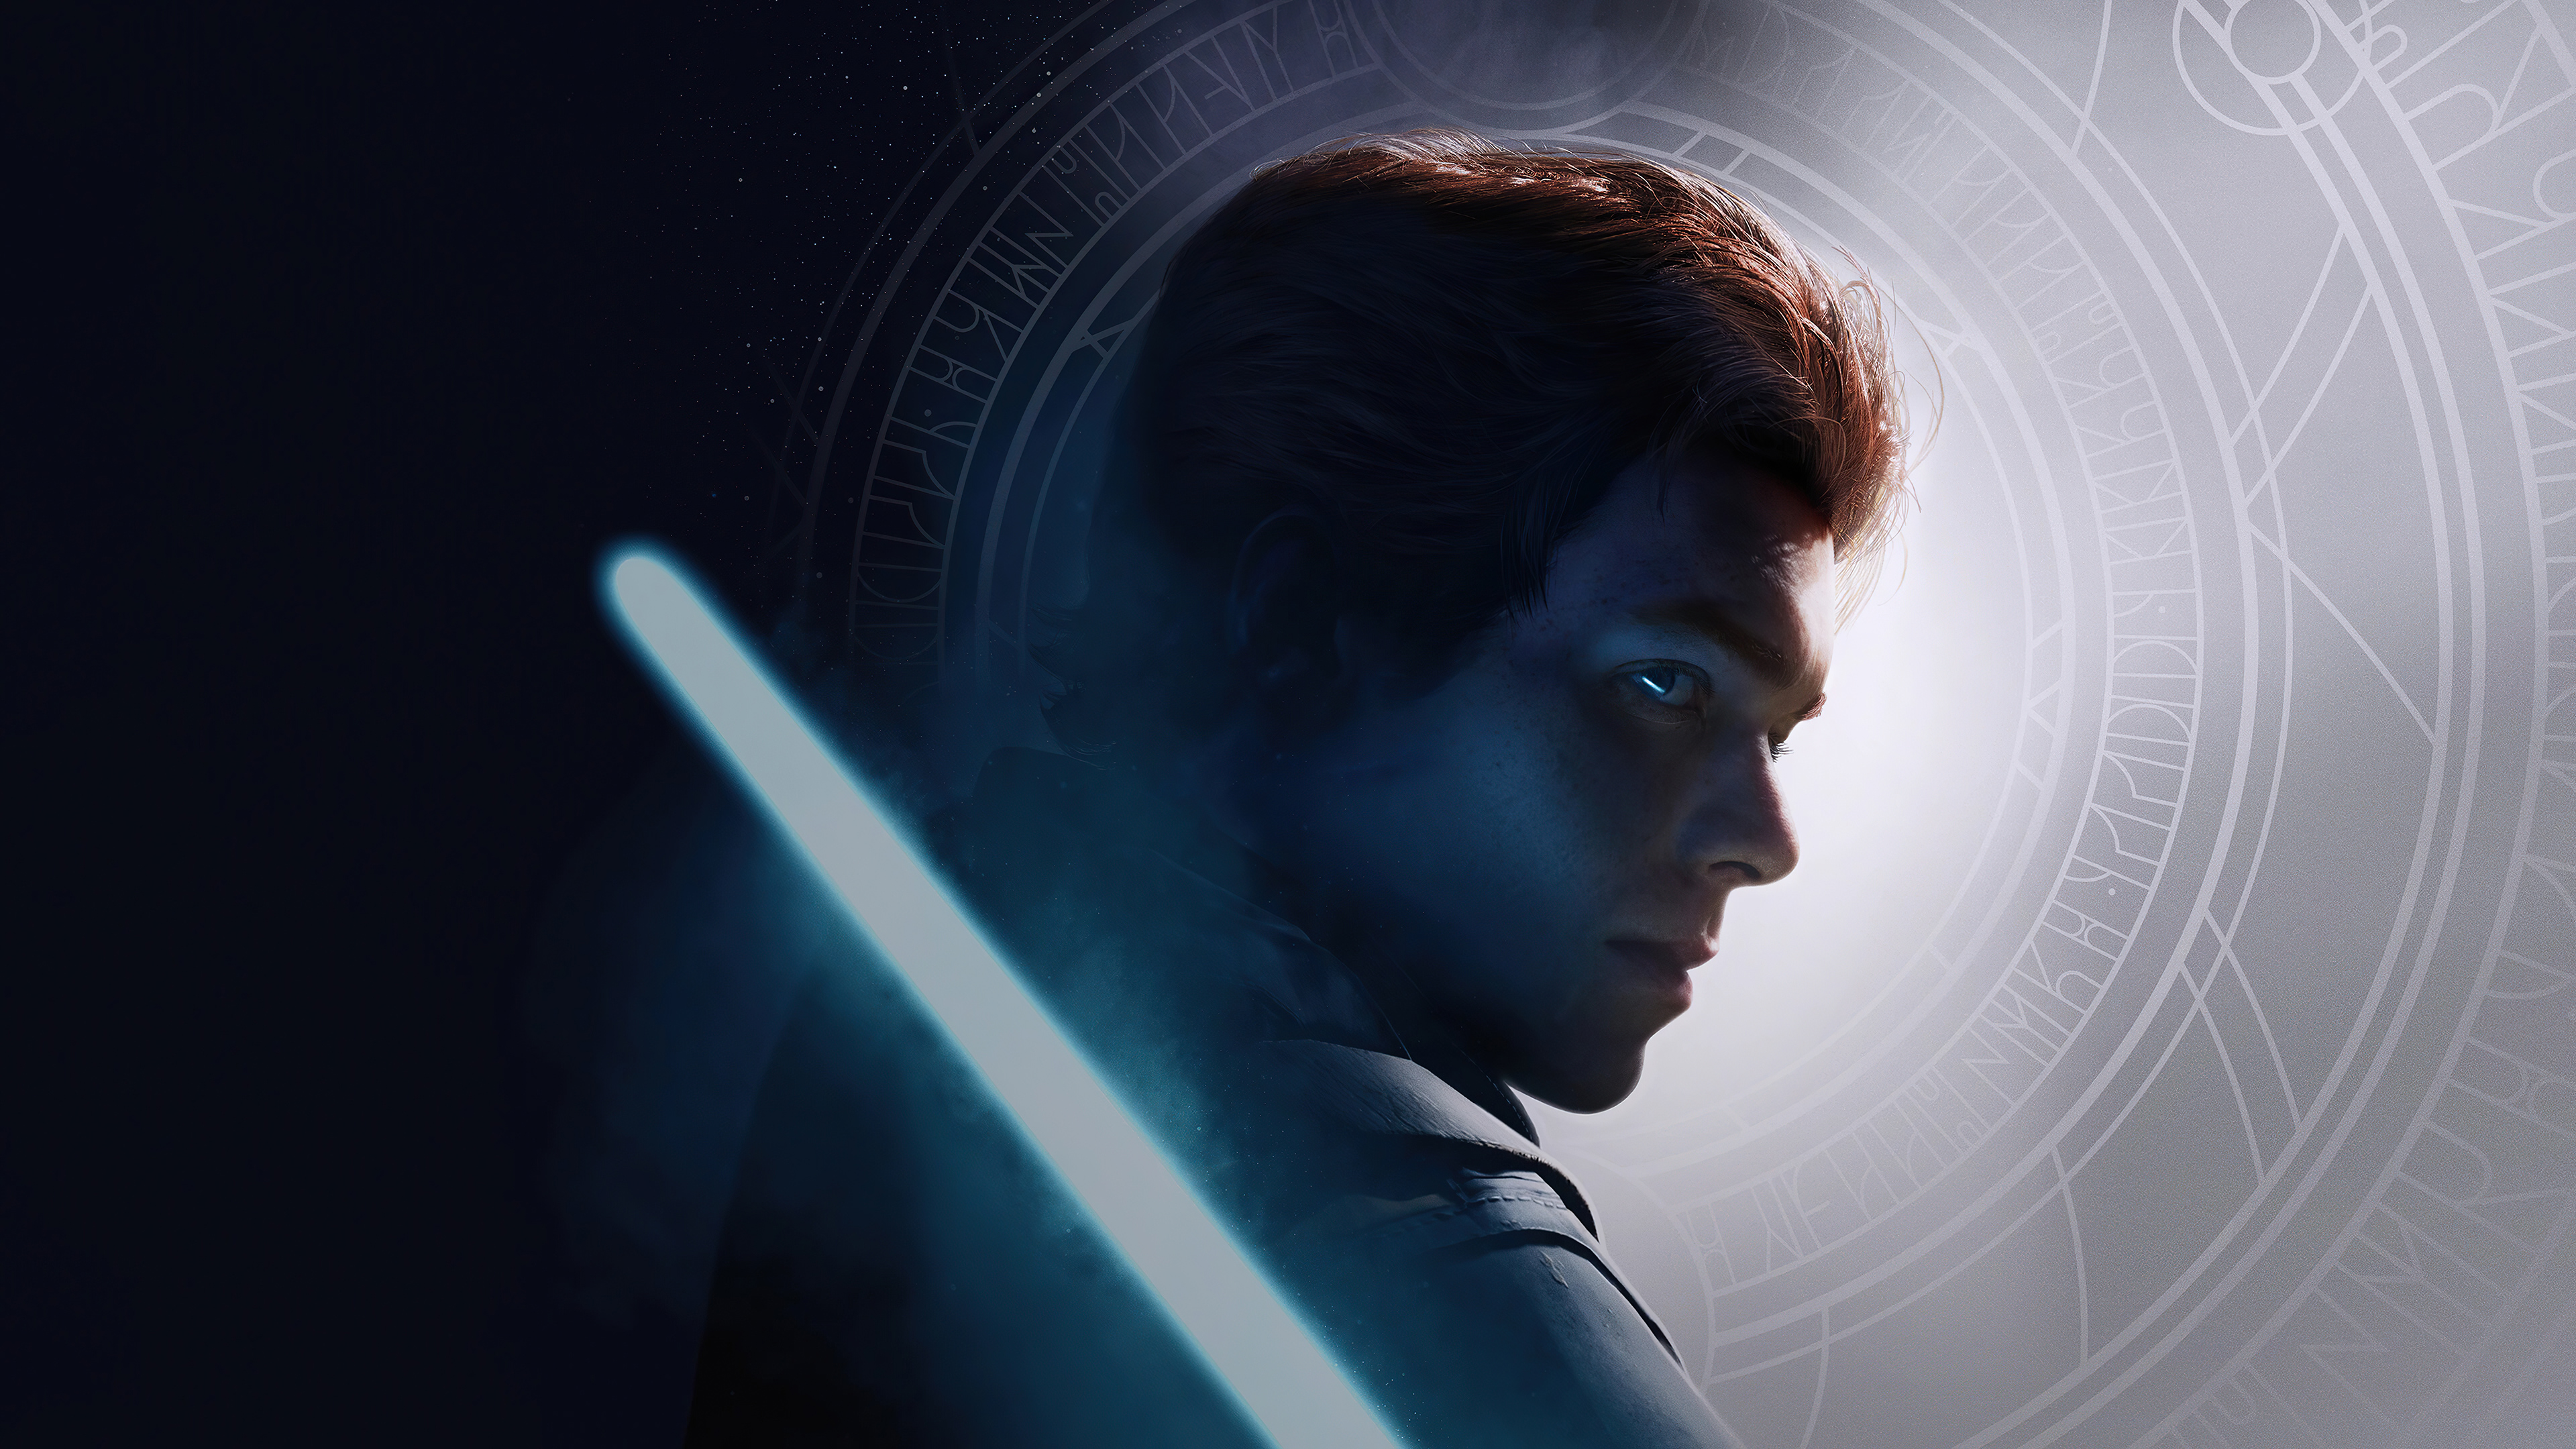 Fondos de pantalla Star Wars Jedi Fallen Order